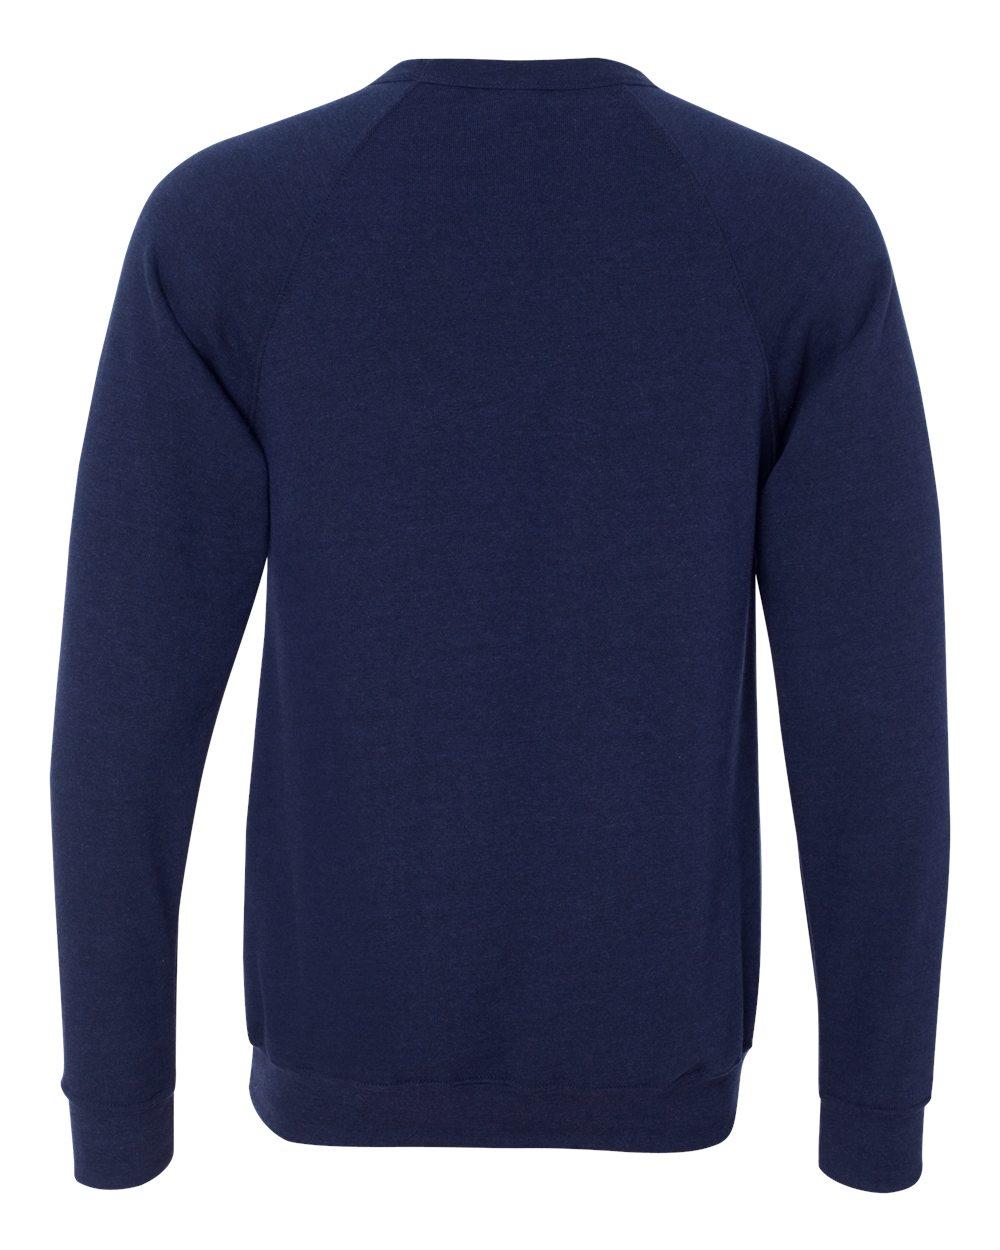 Bella-Canvas-Unisex-Sponge-Fleece-Crewneck-Sweatshirt-Top-Blank-3901-up-to-2XL thumbnail 56